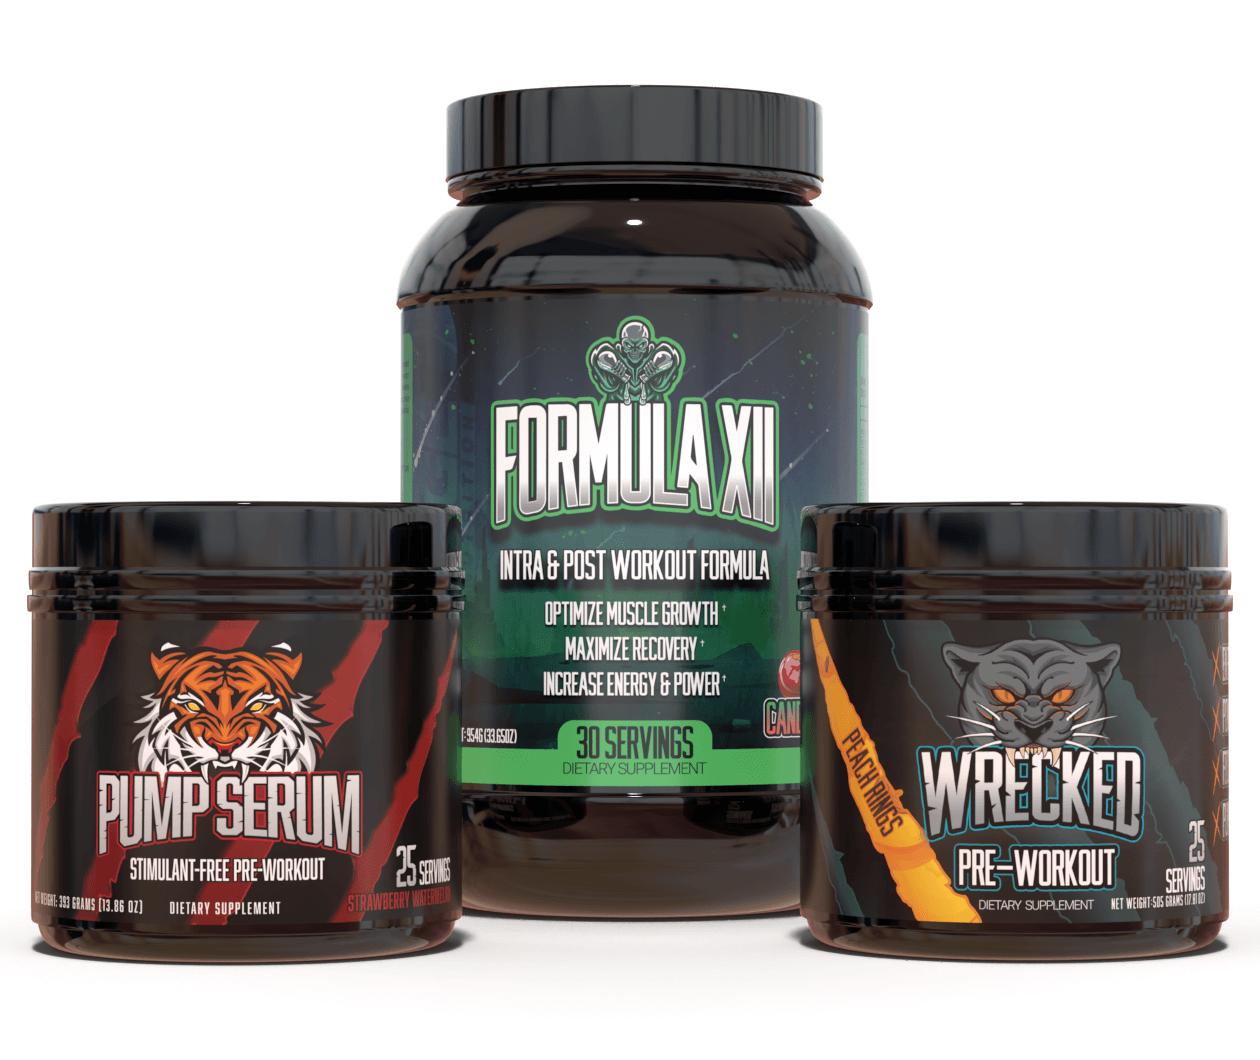 Enhanced Pre-Workout Stack (Wrecked, Pump Serum & Formula XII)